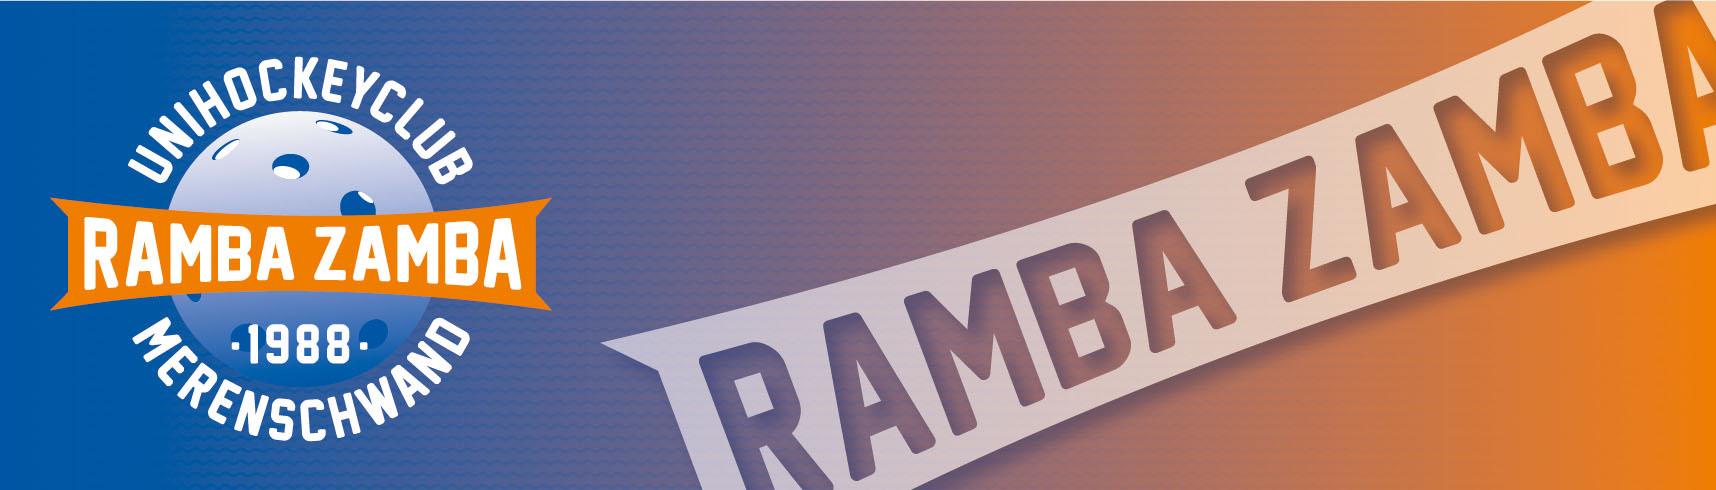 UHC Ramba Zamba Merenschwand